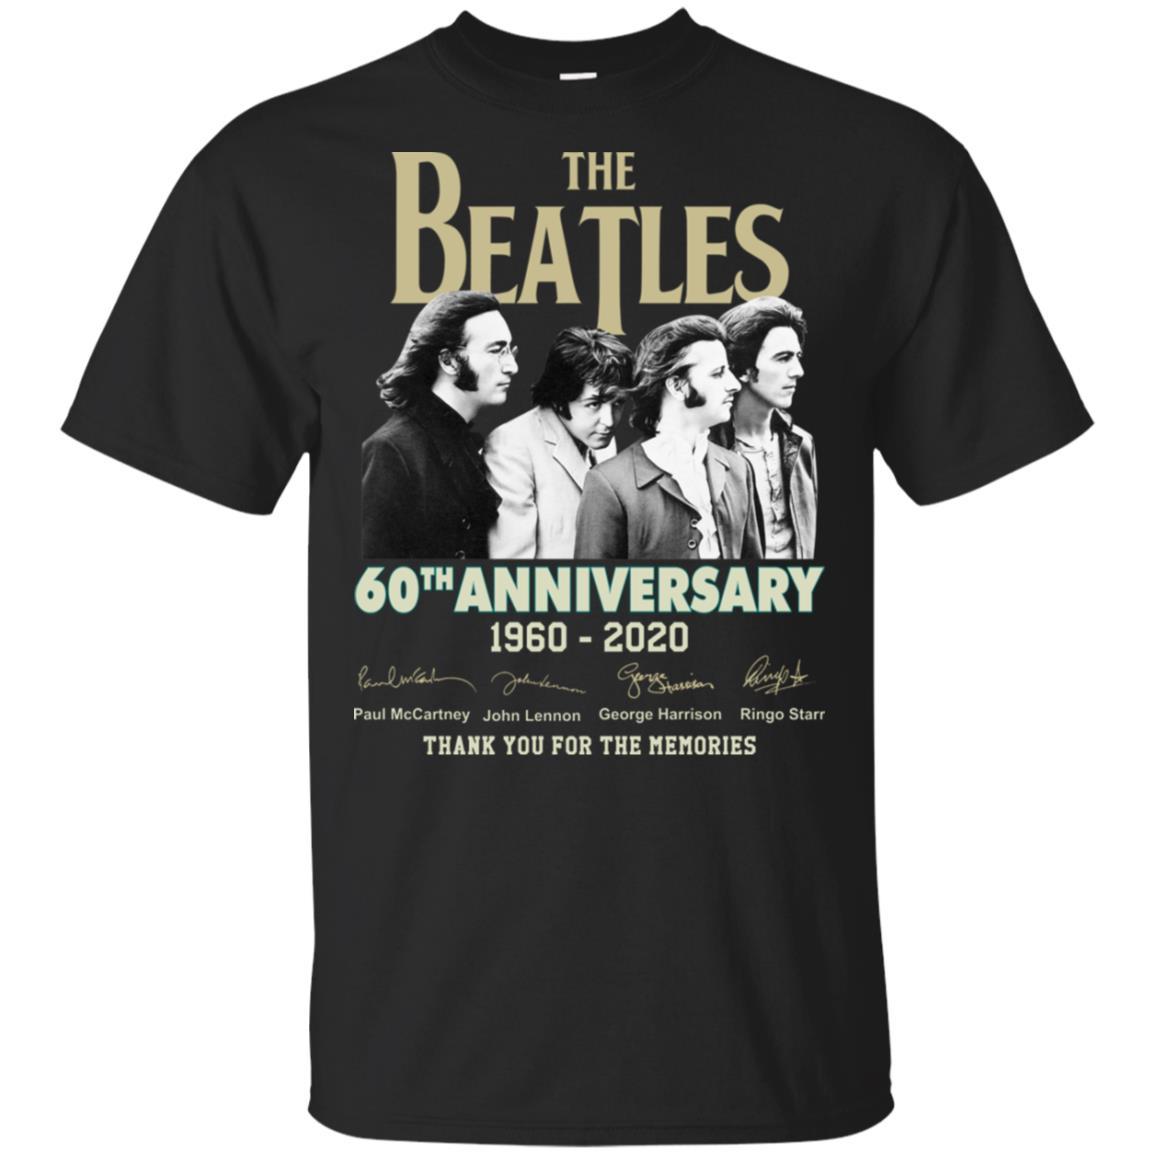 The Beatles 60th Anniversary Shirt